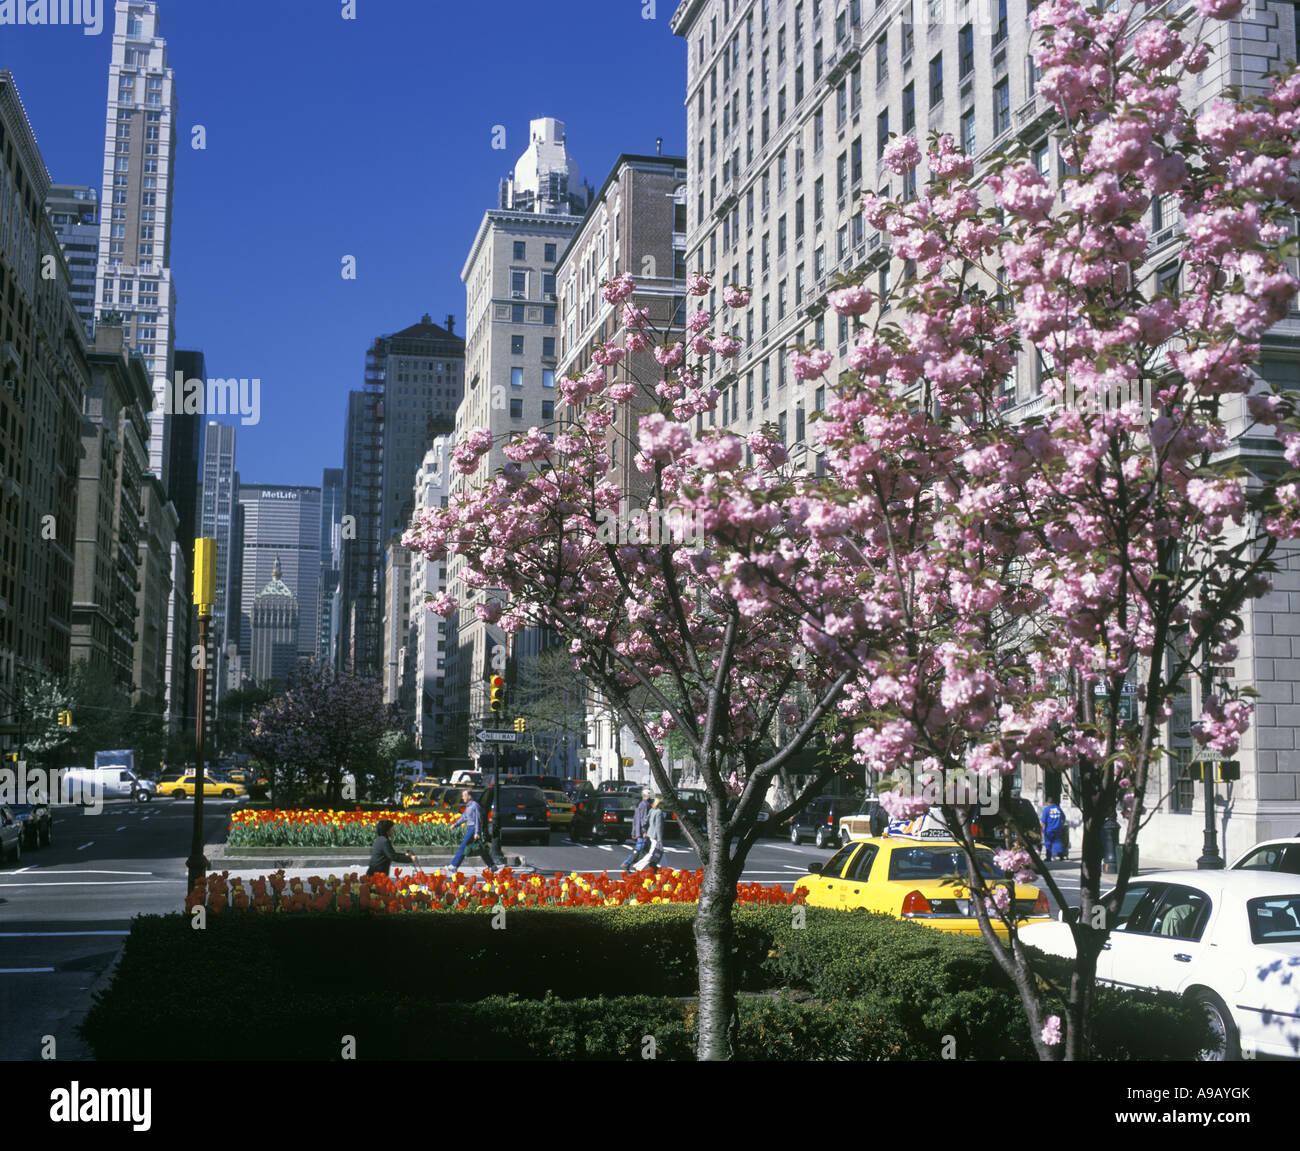 City Manhattan: SPRING STREET SCENE PARK AVENUE MANHATTAN NEW YORK CITY